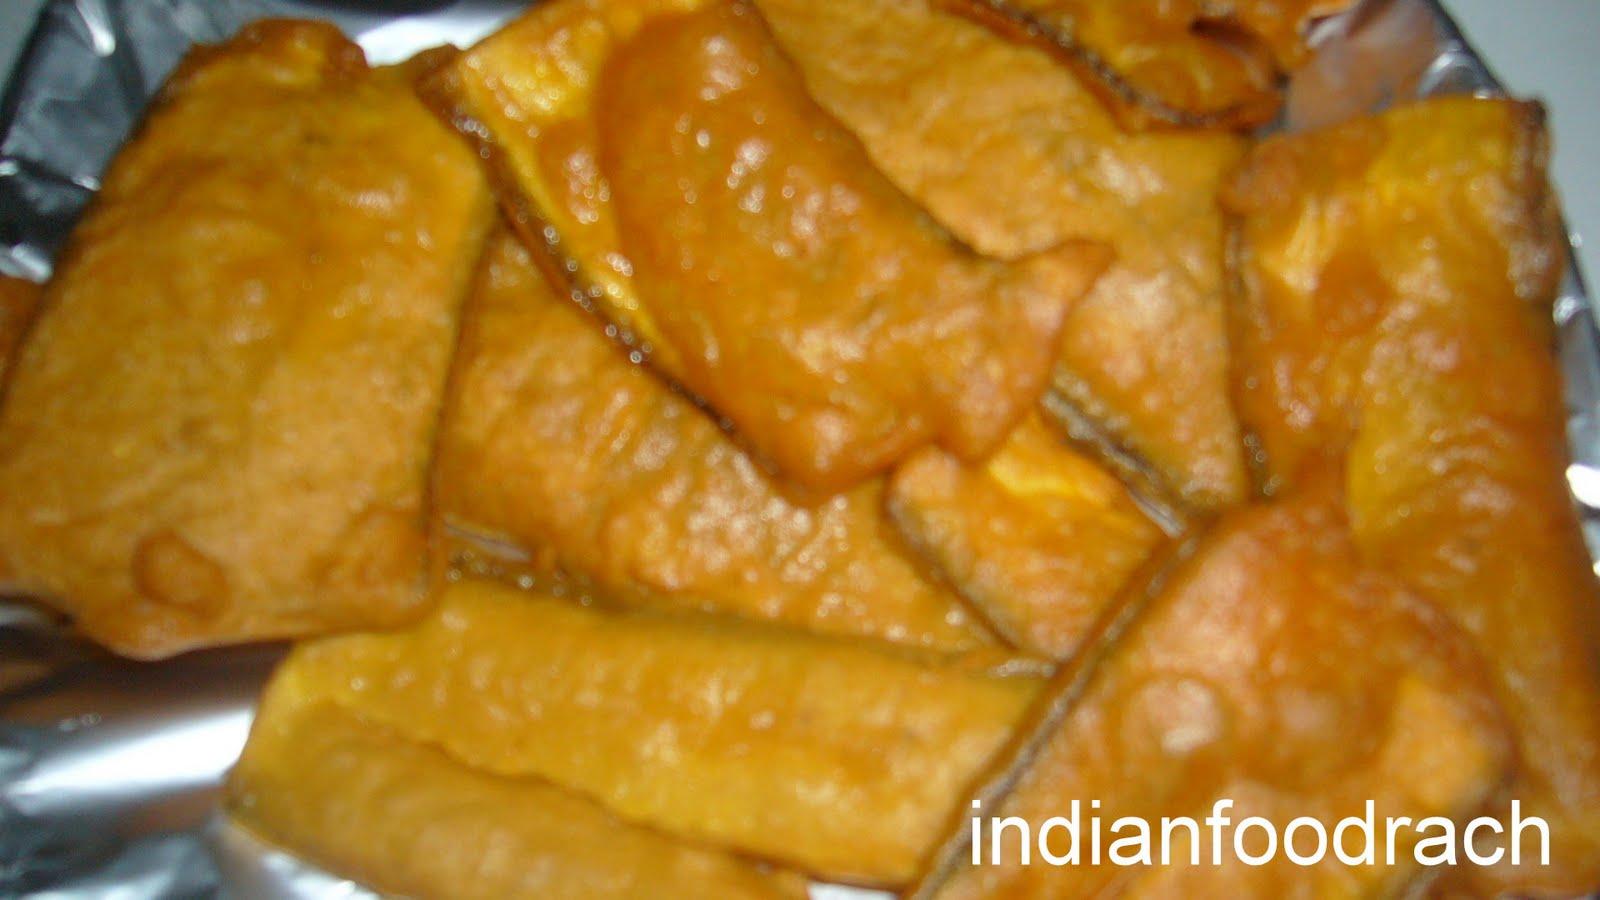 Indian Fried Banana Cakes